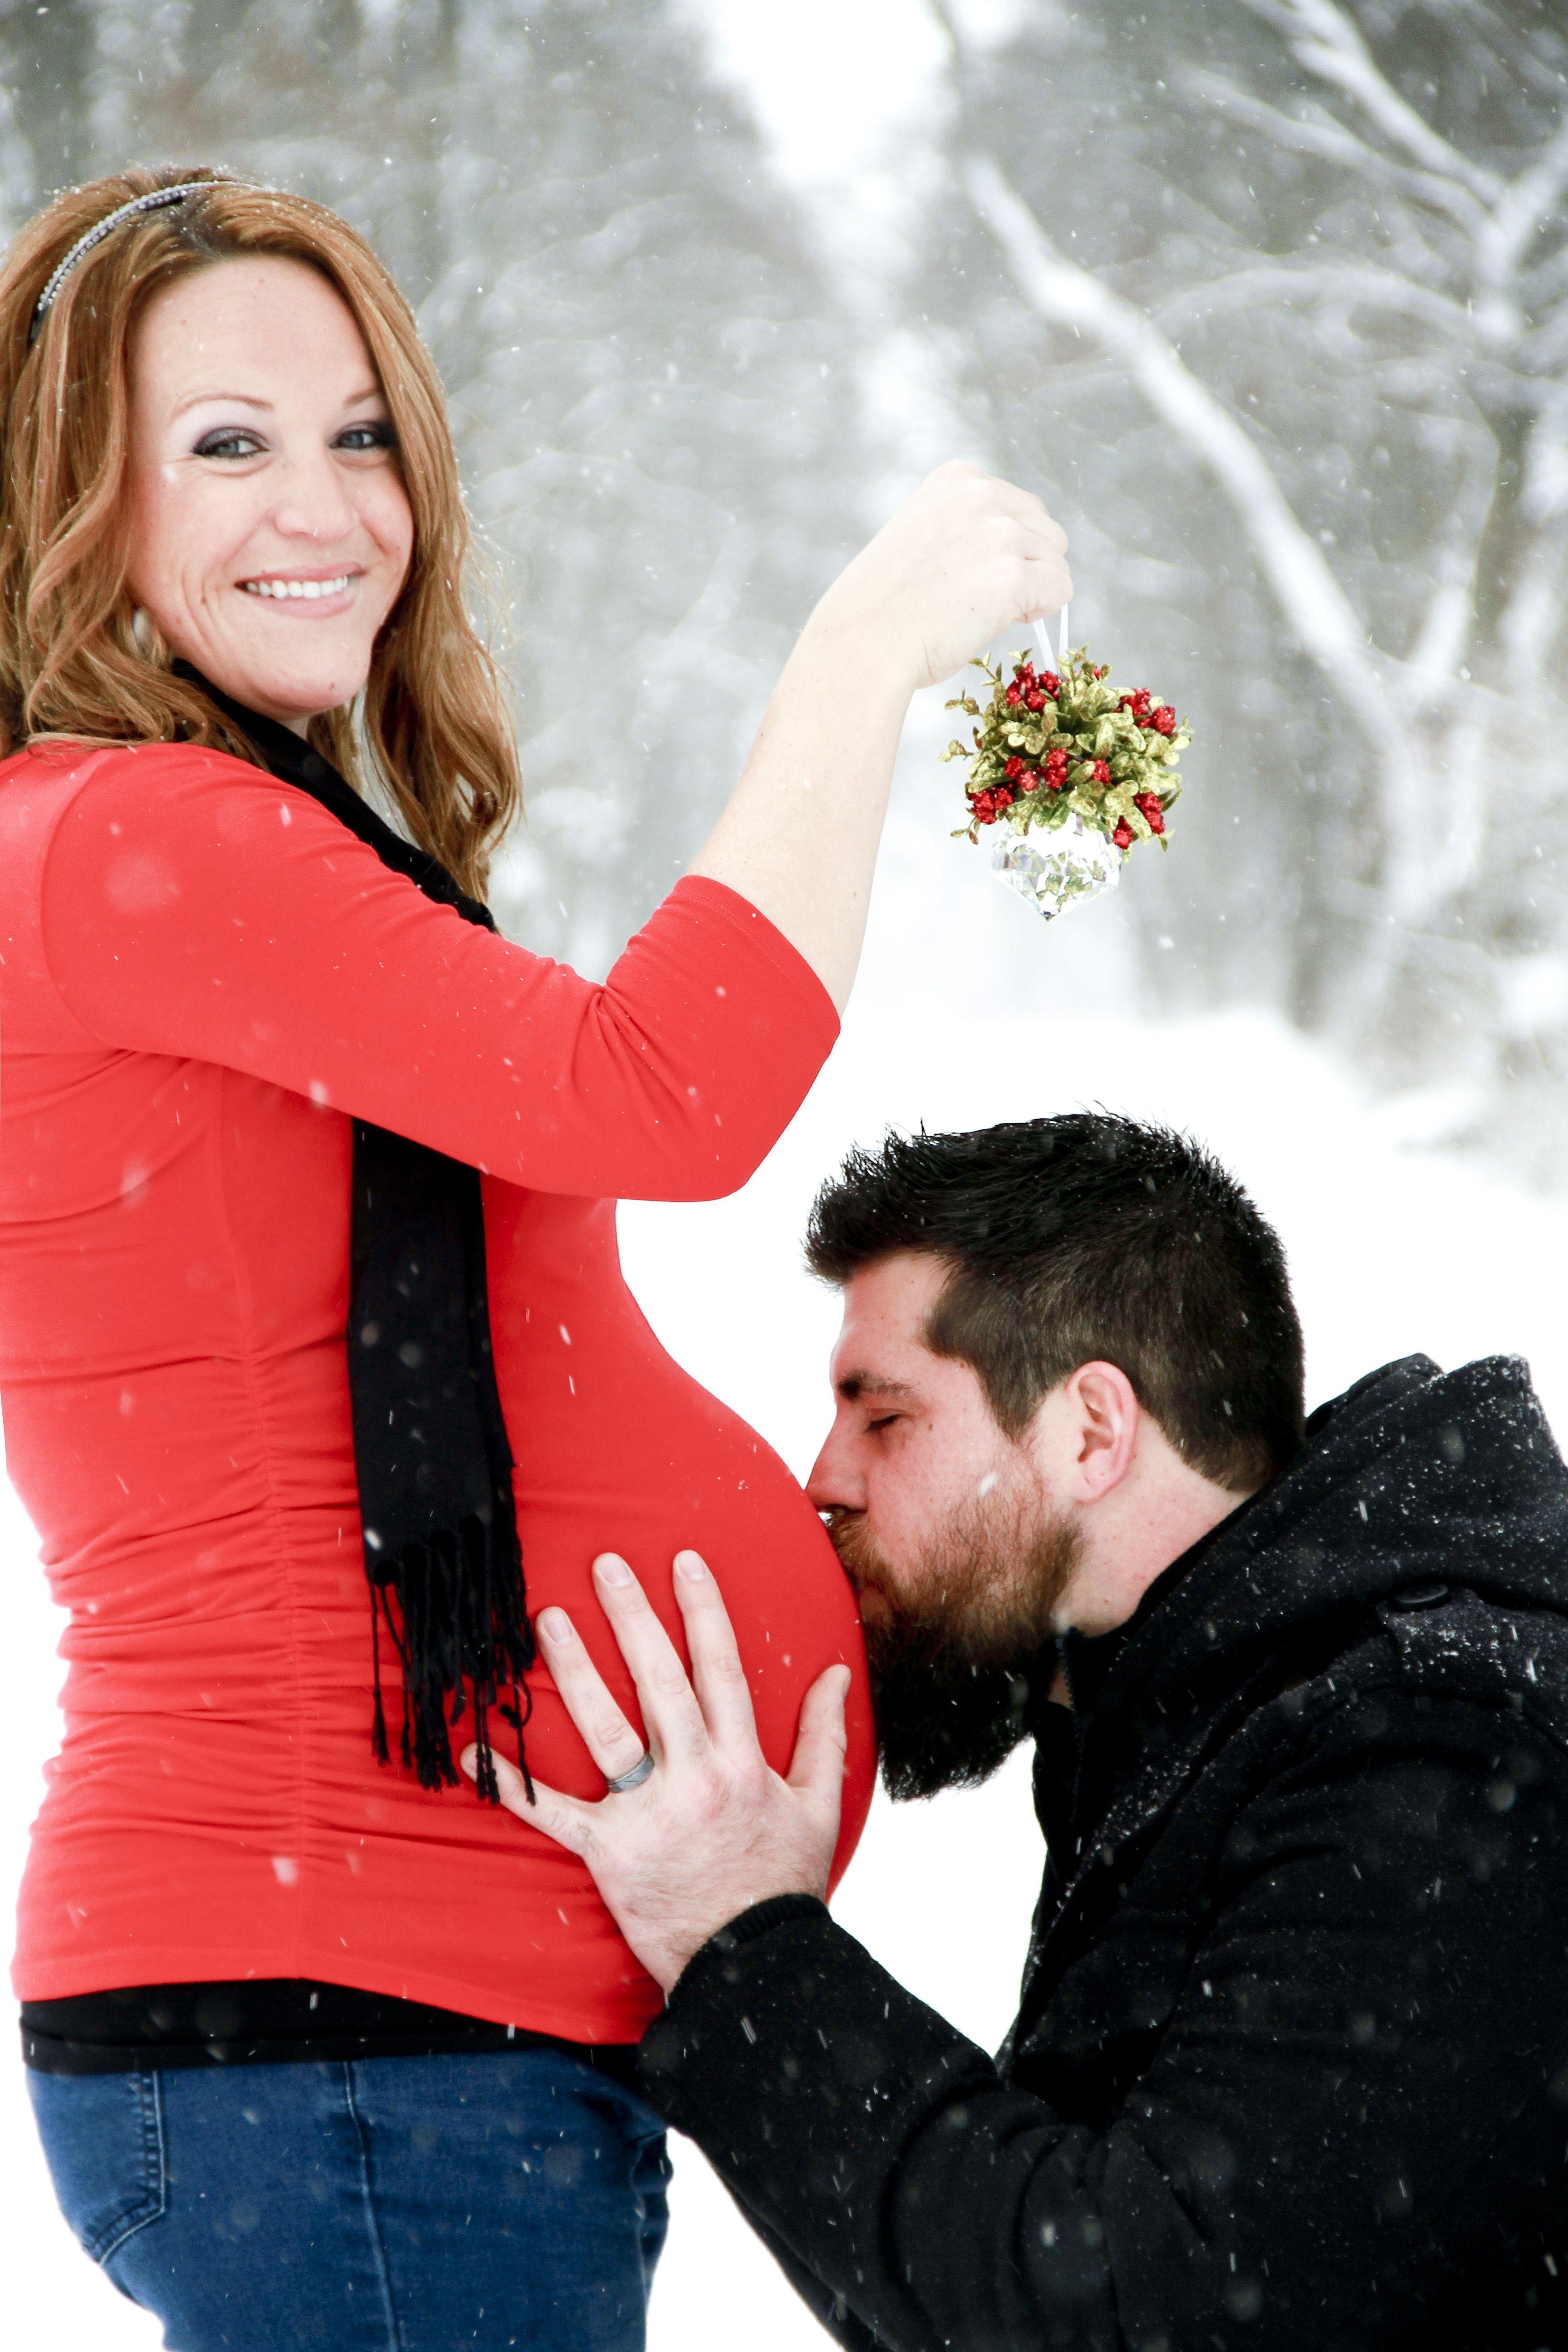 Maternity Photo Shoot Outside Winter Snow Falling Ashley Klemm Photography So Cute If